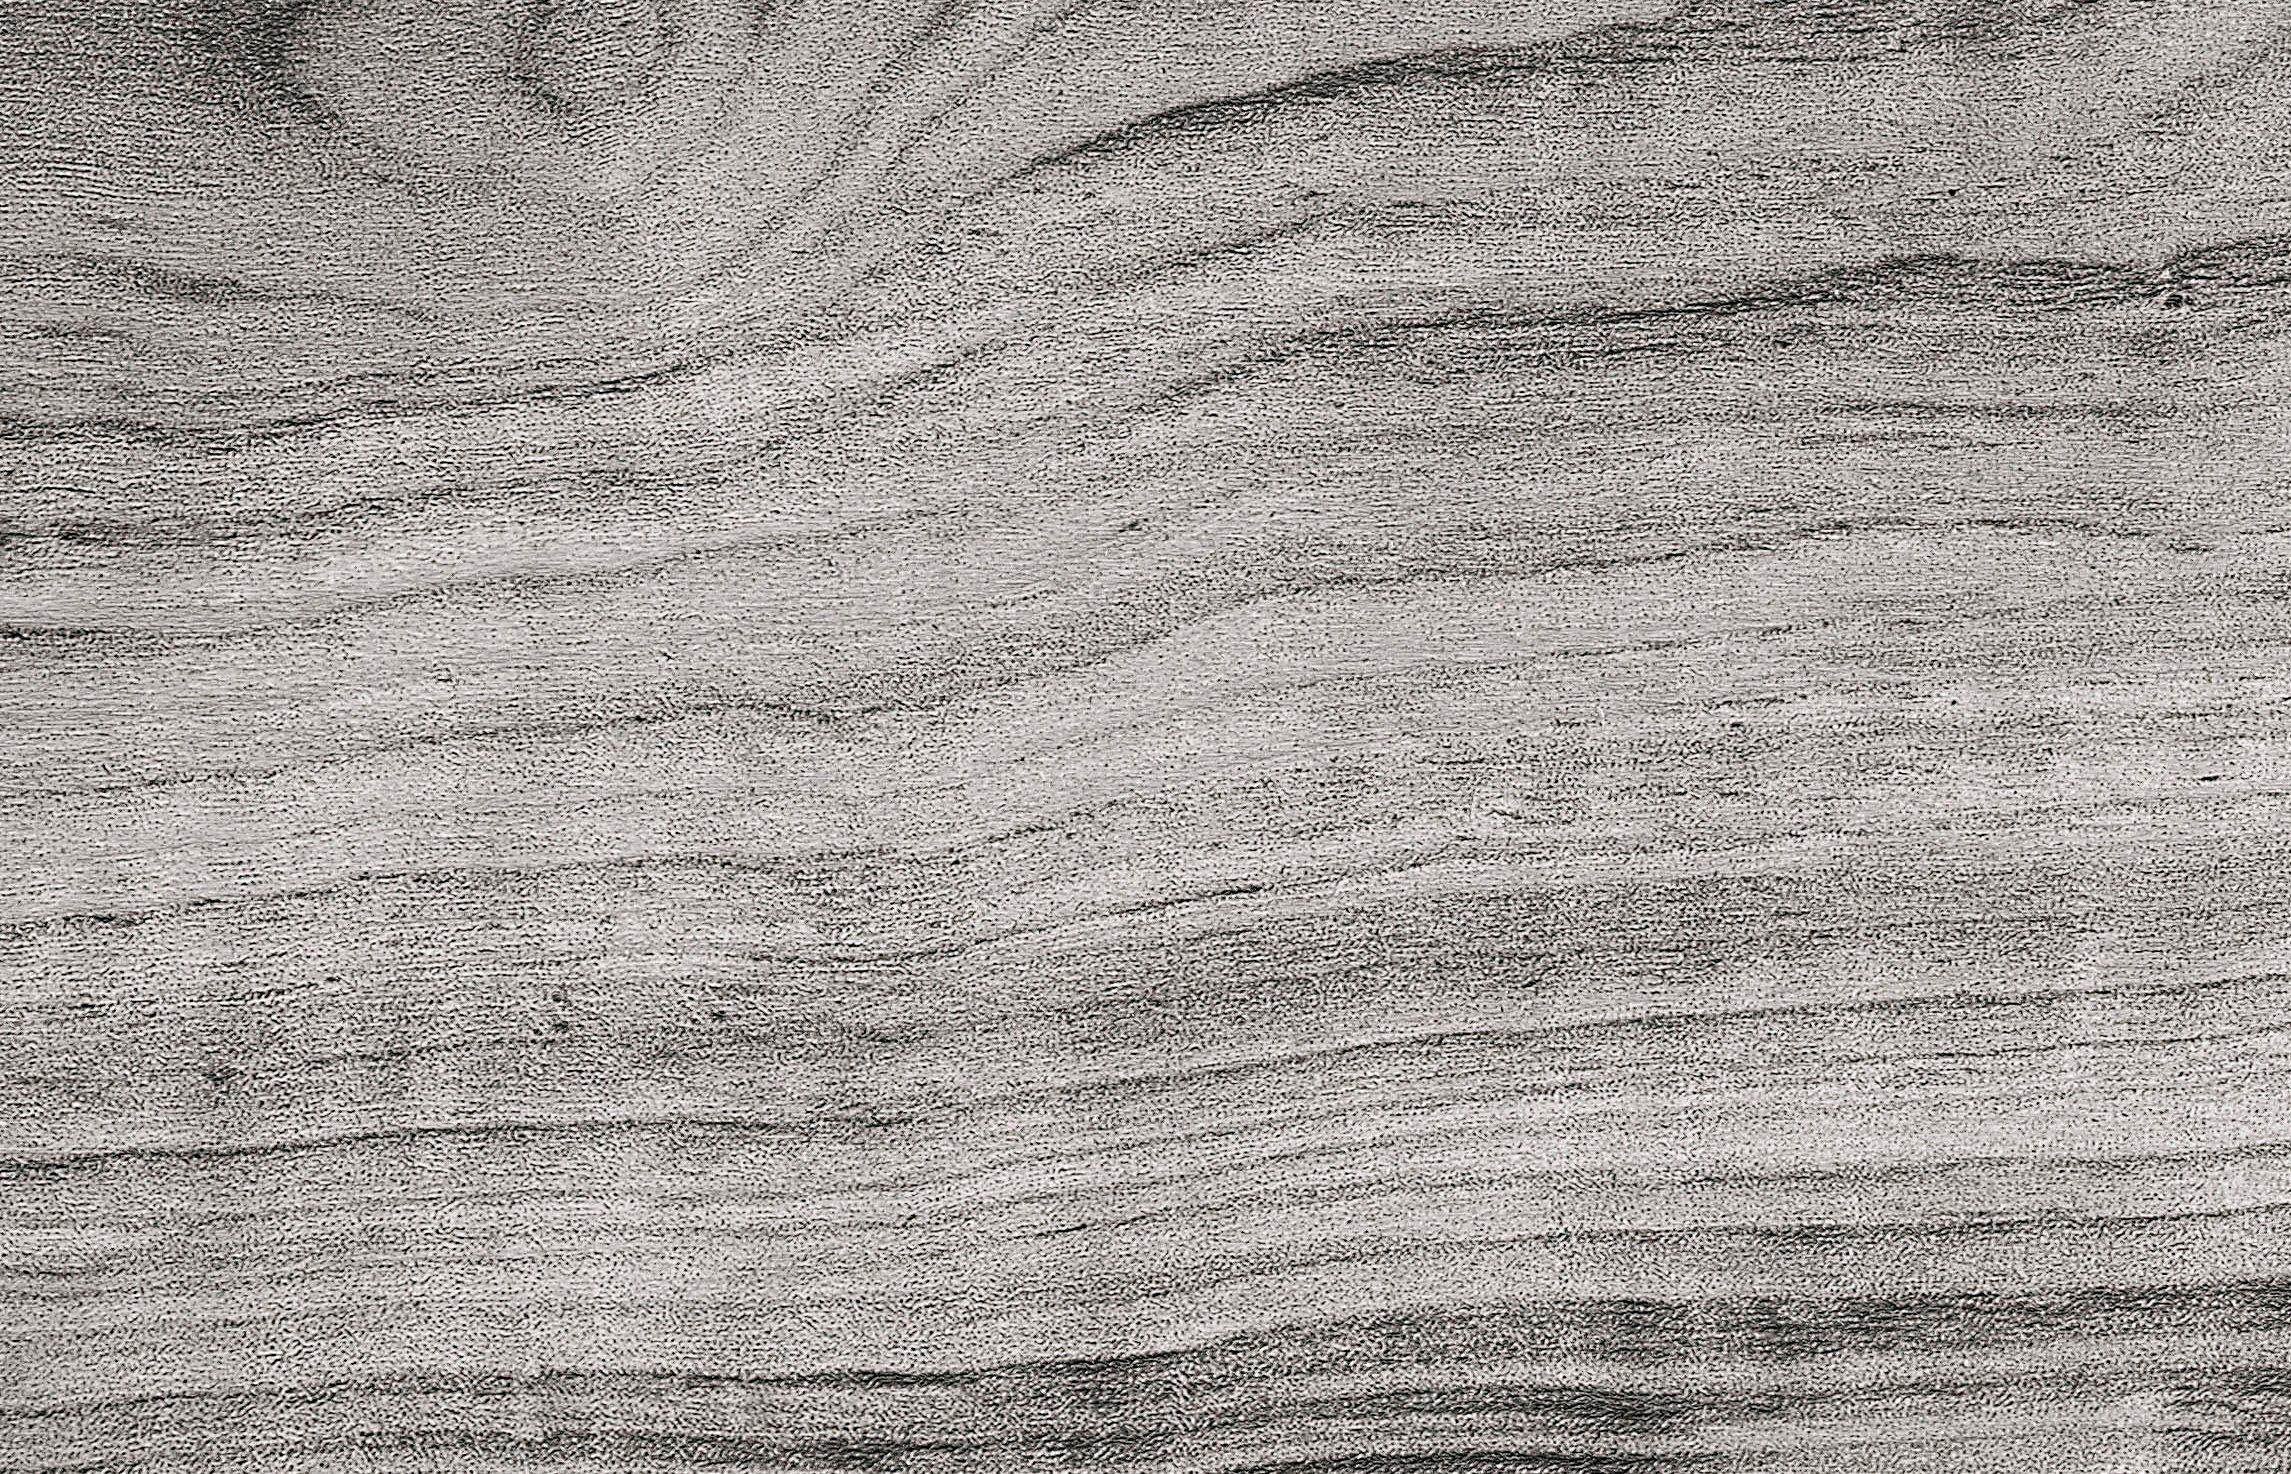 Fußbodenbelag Kreuzworträtsel 8 Buchstaben ~ Sparset pvc boden pvc planke stück« m² selbstklebend